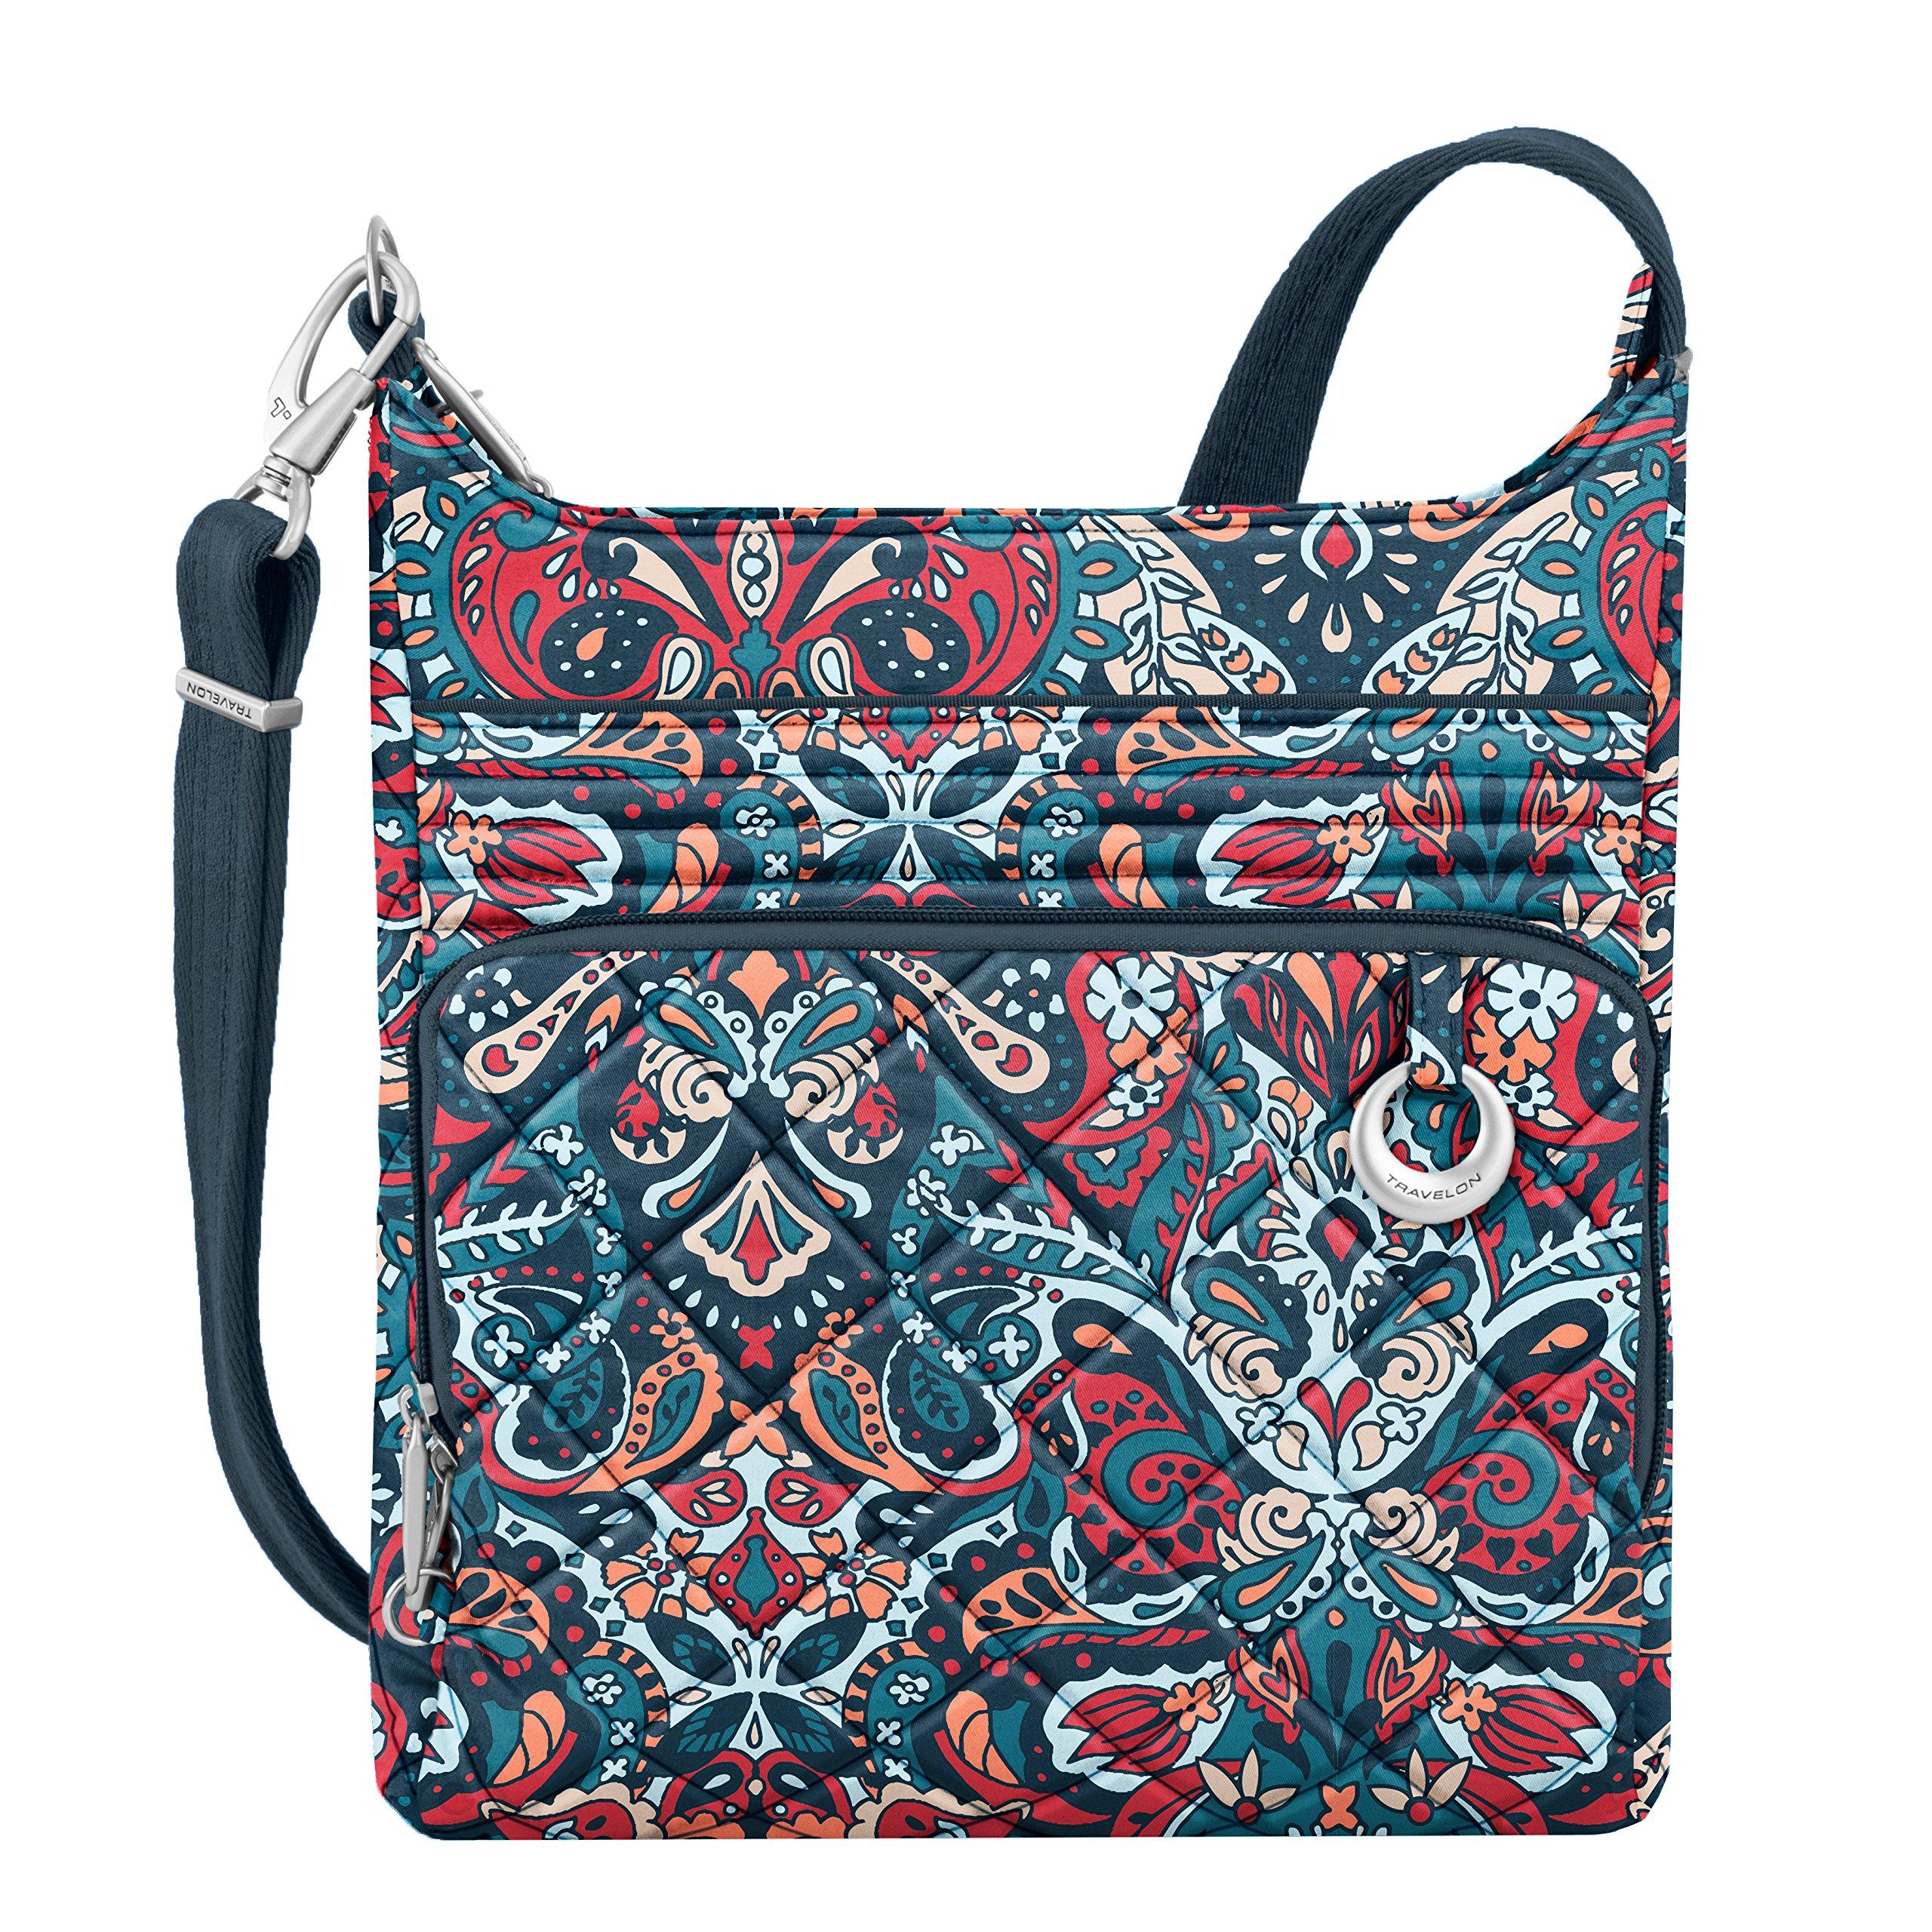 Travelon Women's Anti-Theft Boho N/s Crossbody Cross Body Bag, Summer Paisley, One Size